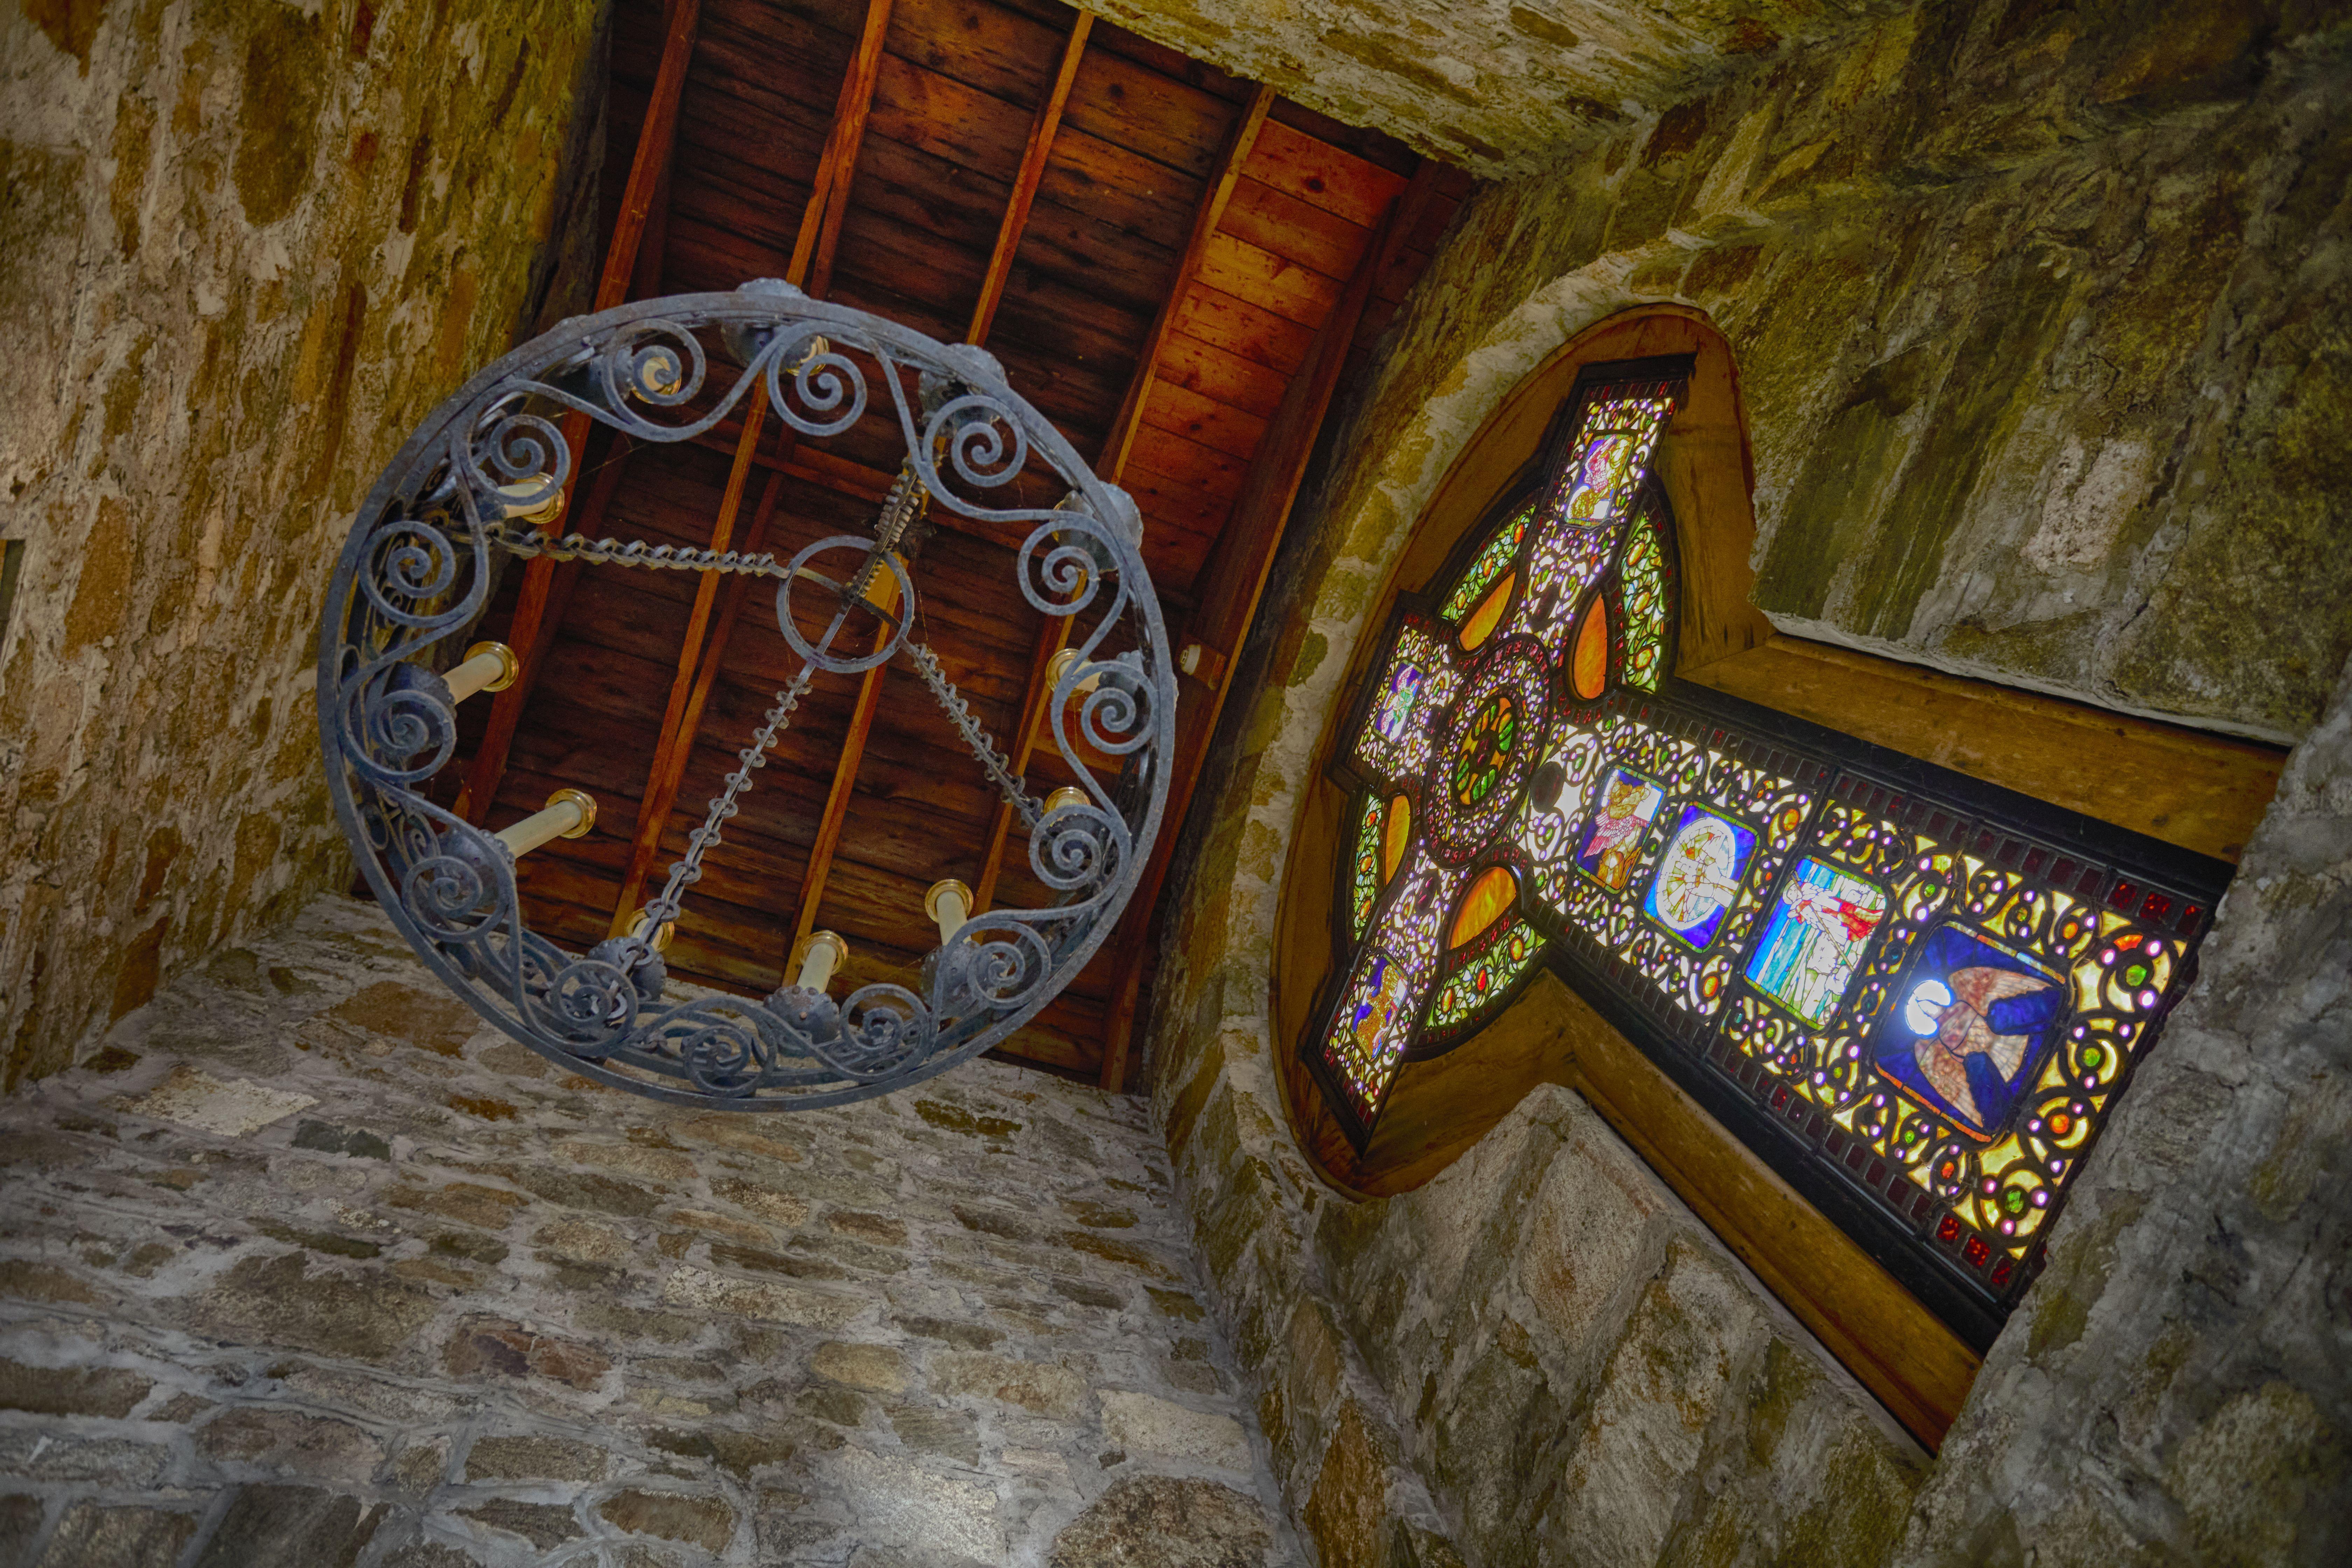 Chandelier hanging from ceiling, beside Celtic Cross. Scene is photographed looking upward.